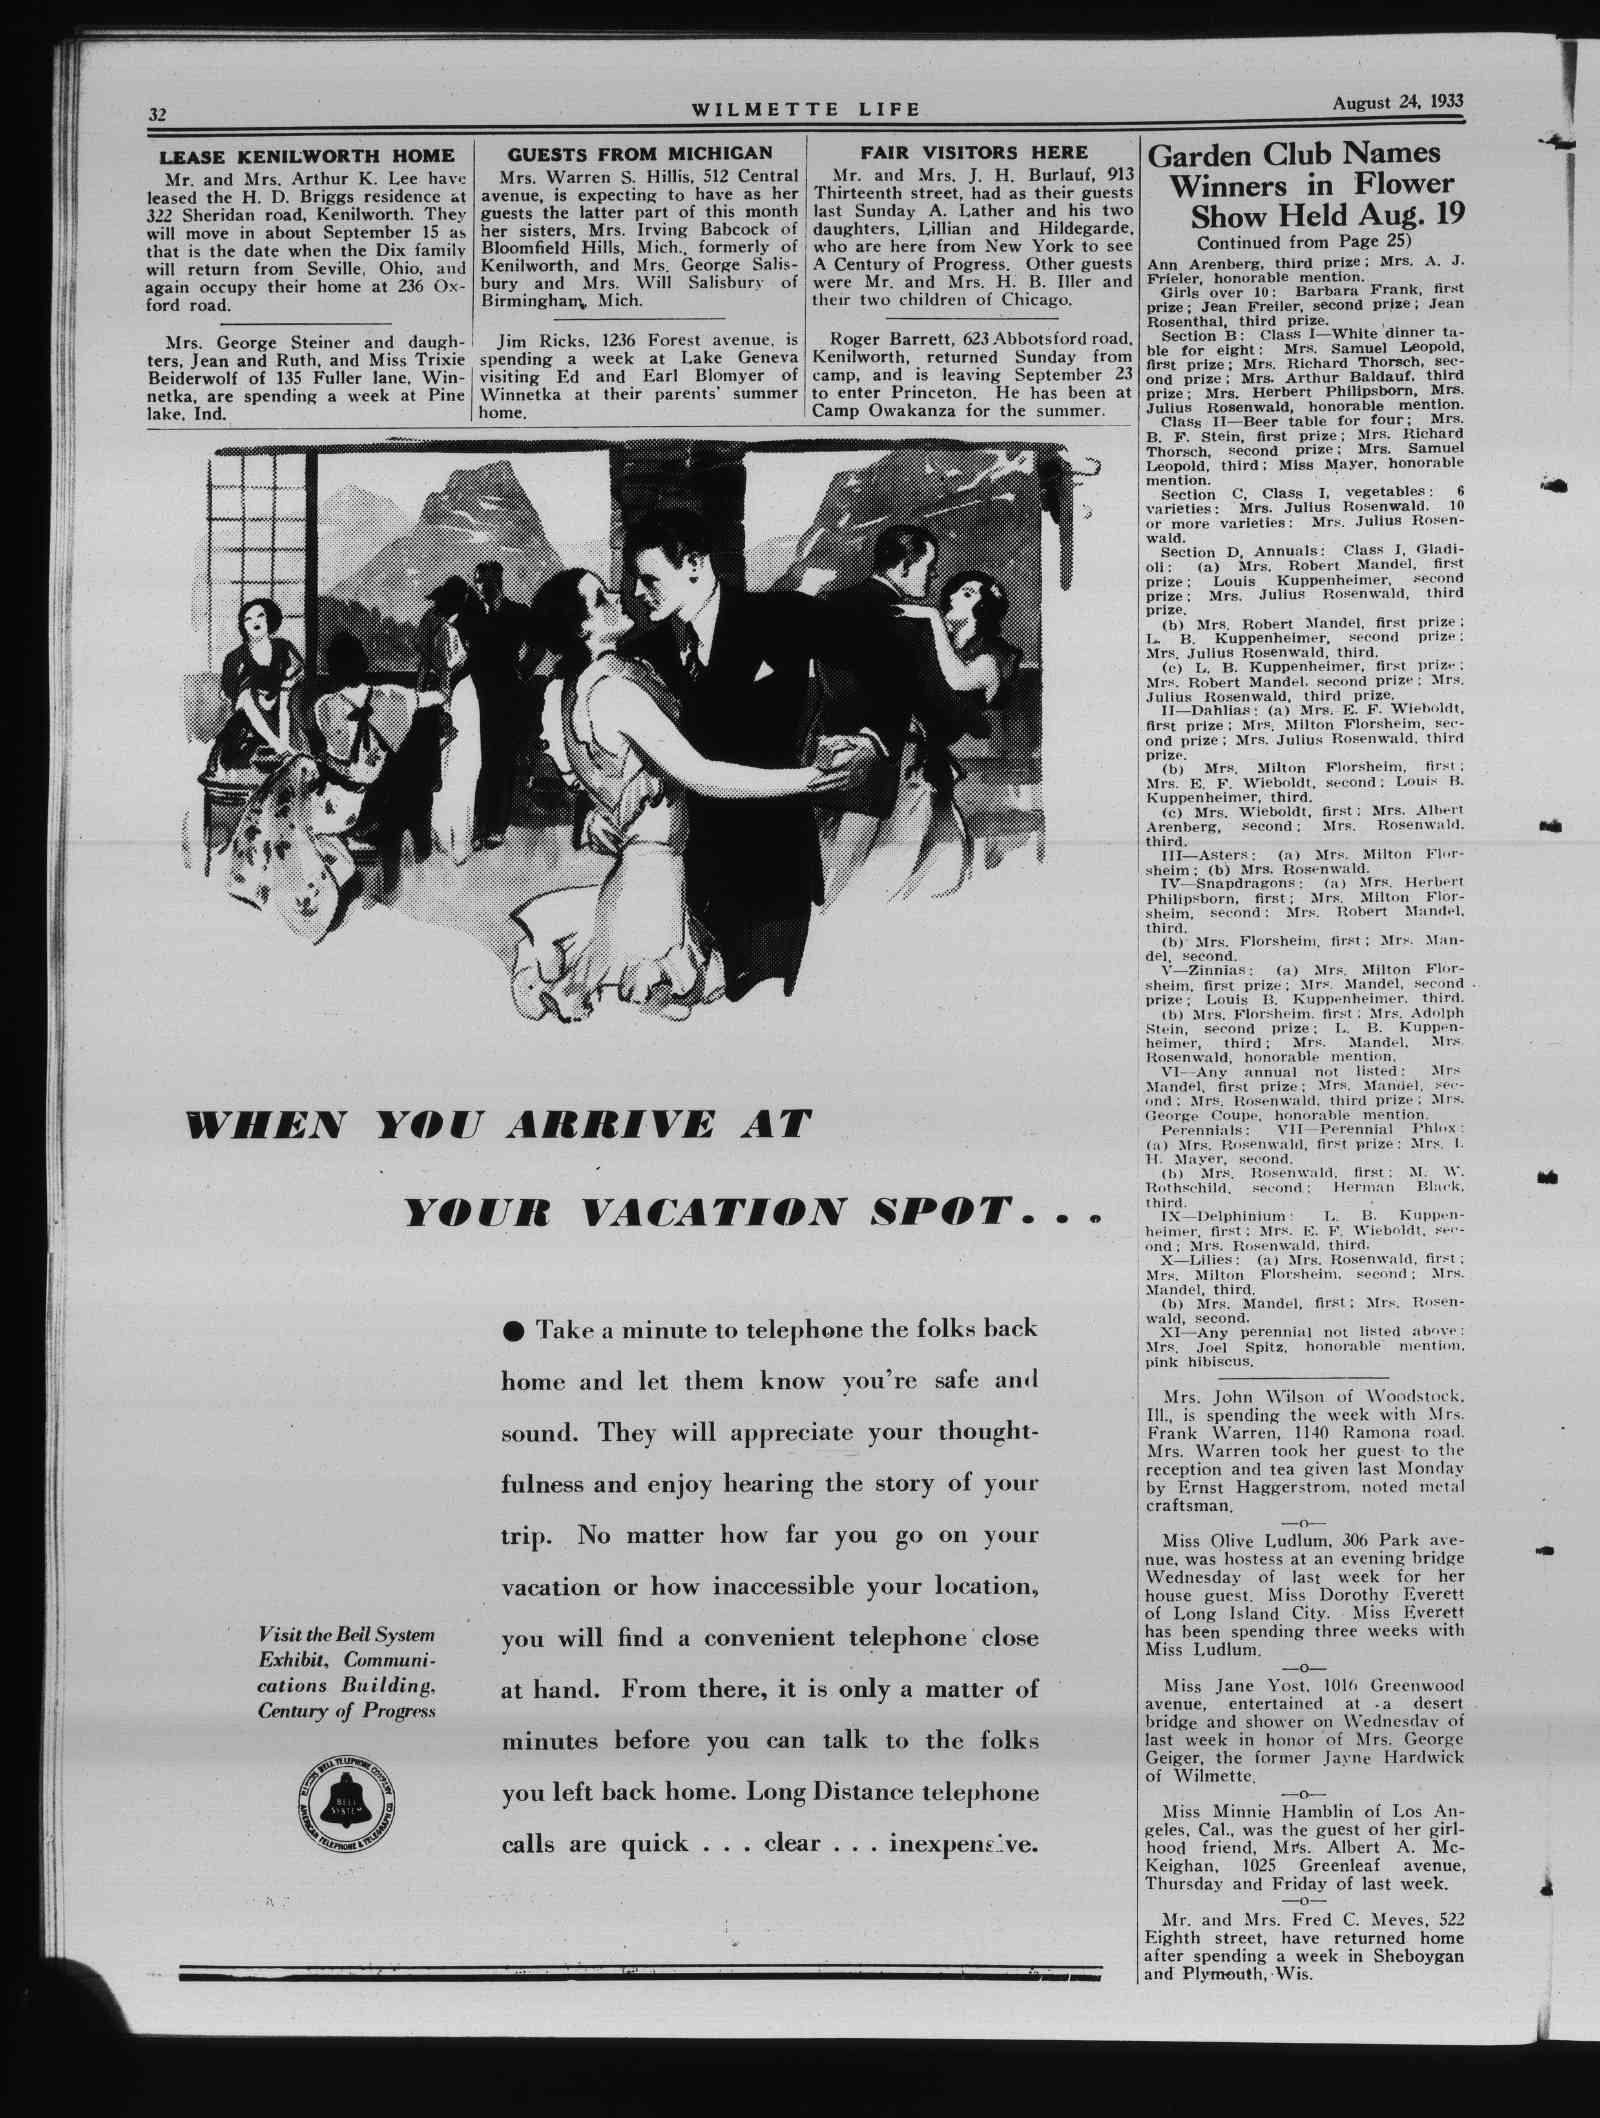 Wilmette Life (Wilmette, Illinois), 24 Aug 1933